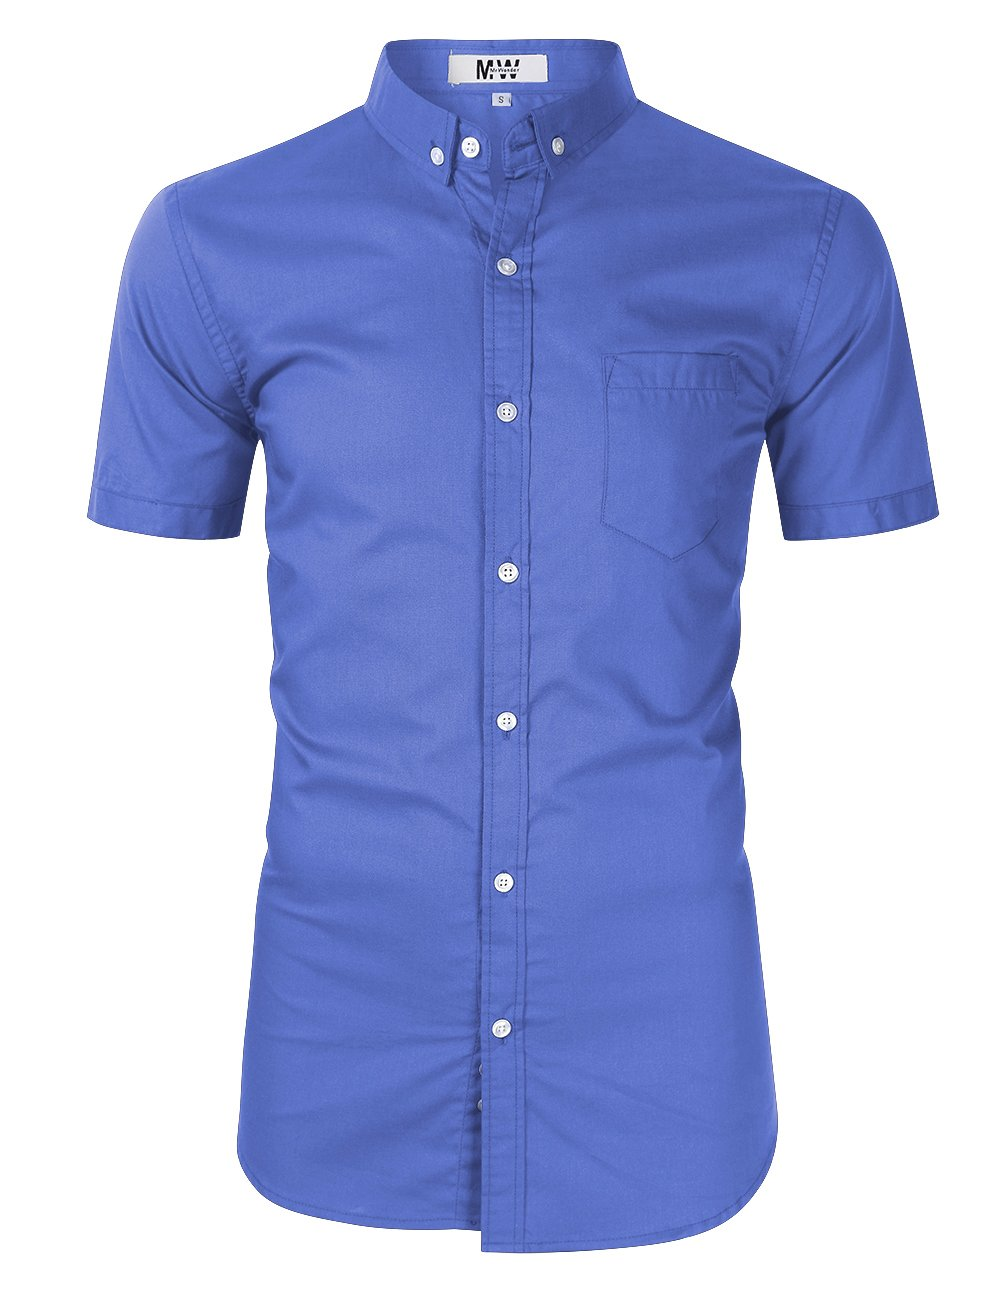 MrWonder Men's Casual Slim Fit Button Down Dress Shirt Long Sleeve Solid Oxford Shirt (M, Short Sleeve Blue)